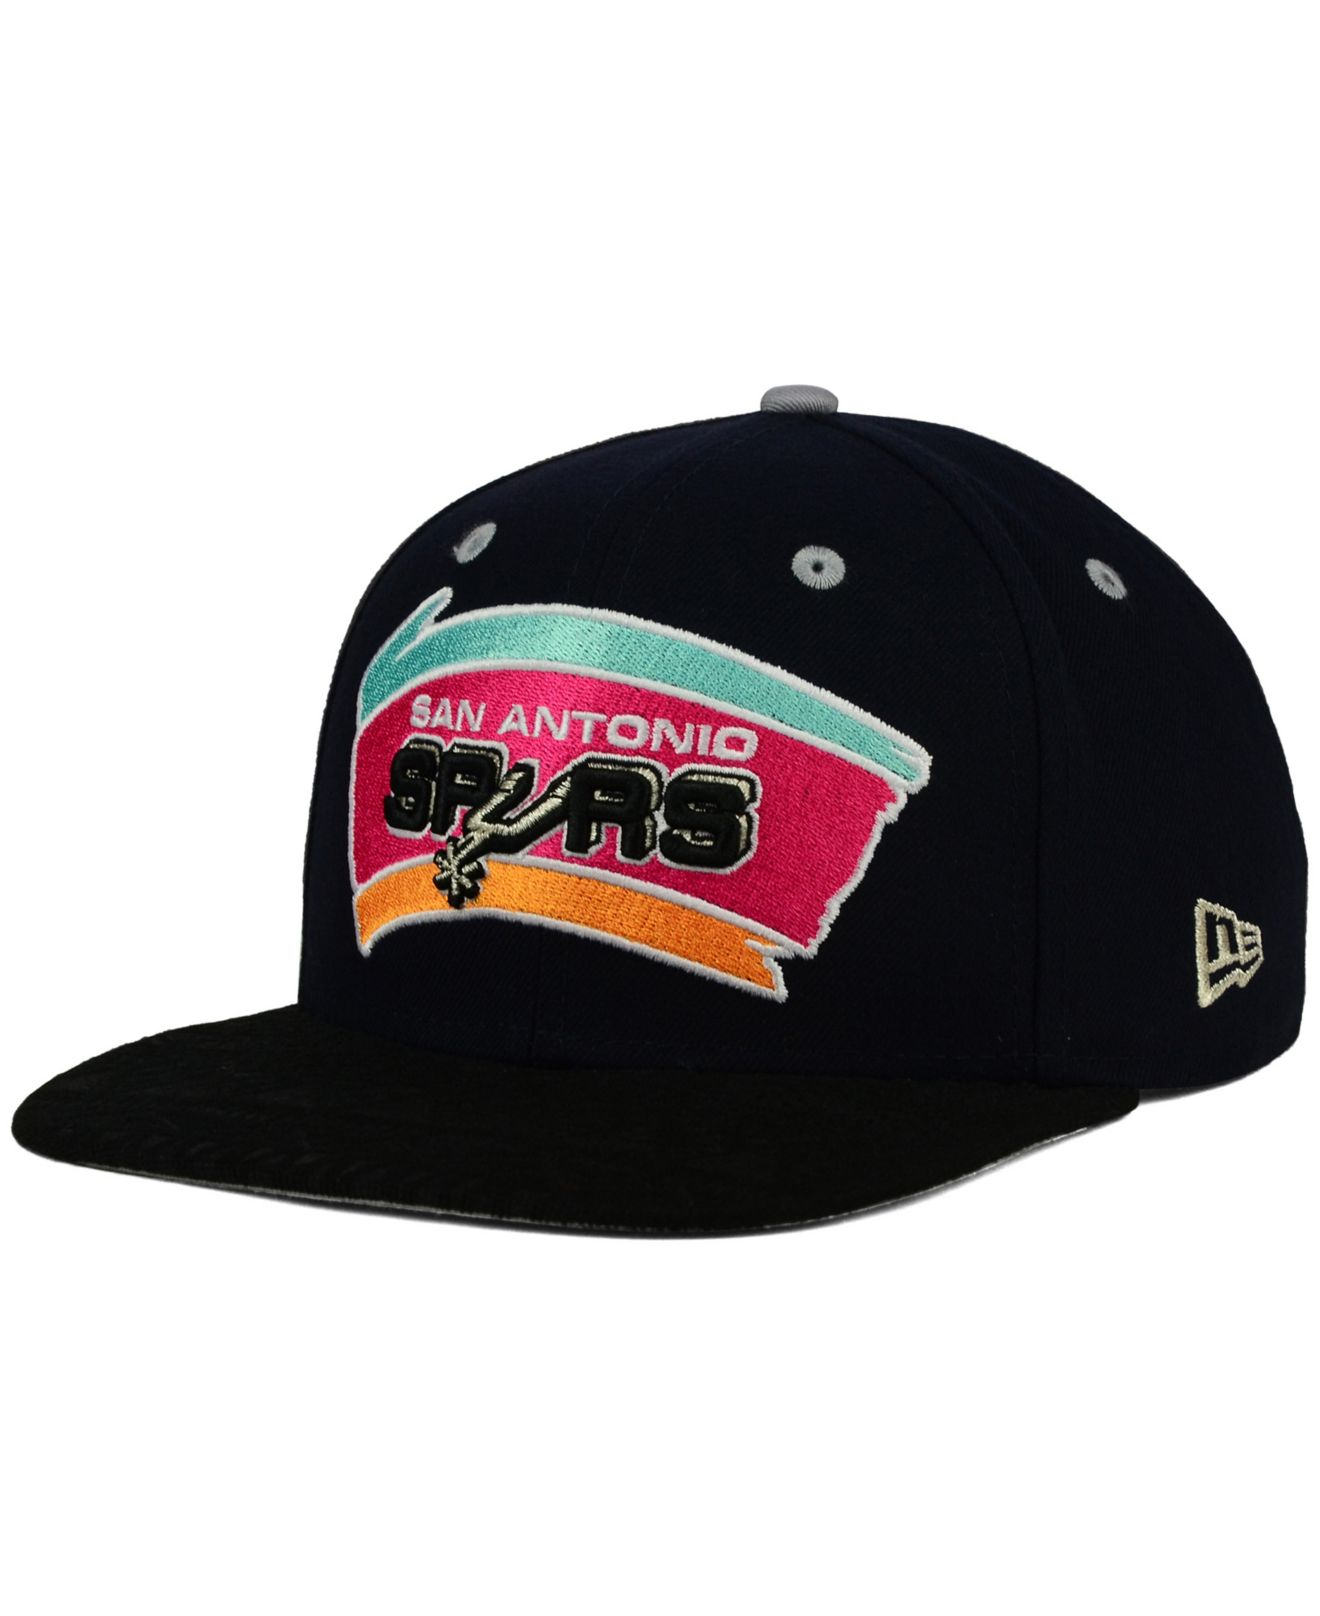 wholesale dealer 40d65 e3f8c ... cheapest lyst ktz san antonio spurs tone 9fifty snapback cap in black  for men 0aea5 856b0